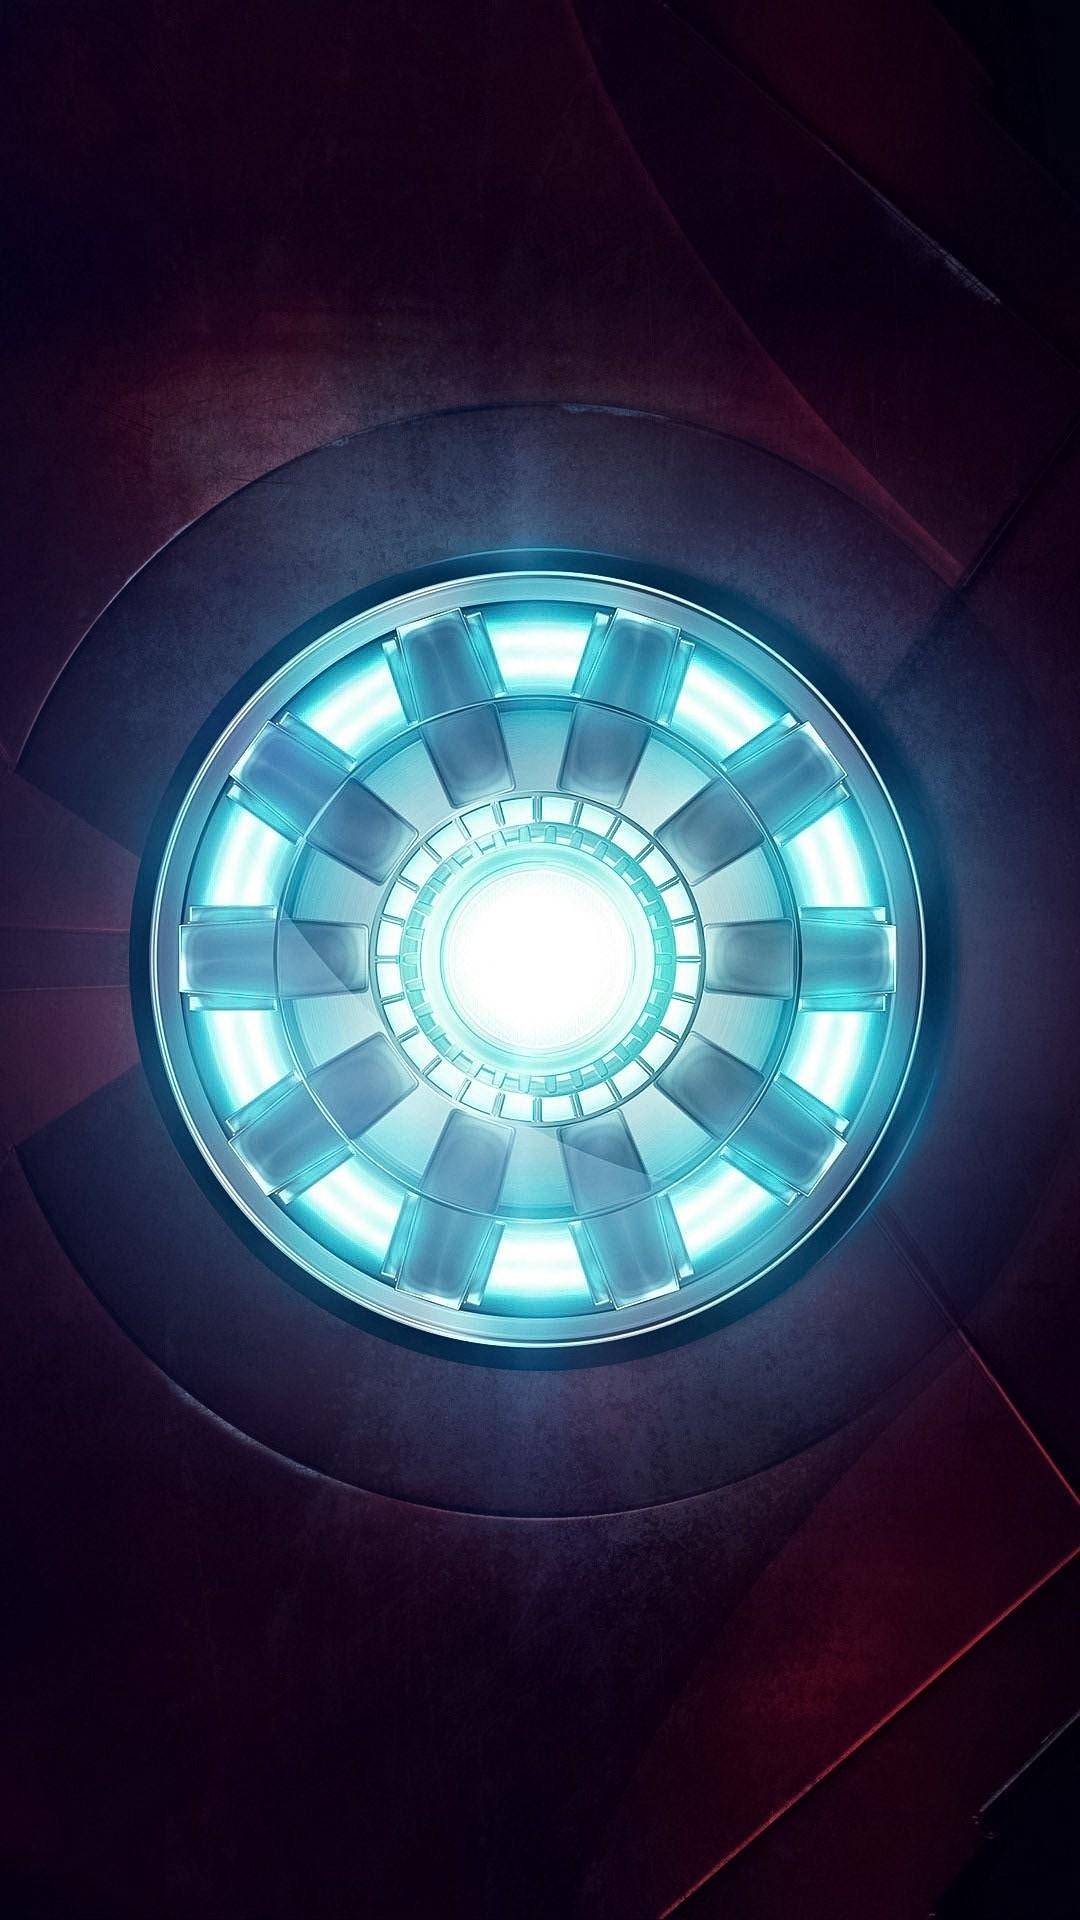 Top 25+ best Wallpaper iron man ideas on Pinterest   Ironman, Iron man  superheroe and Marvel comics wallpaper